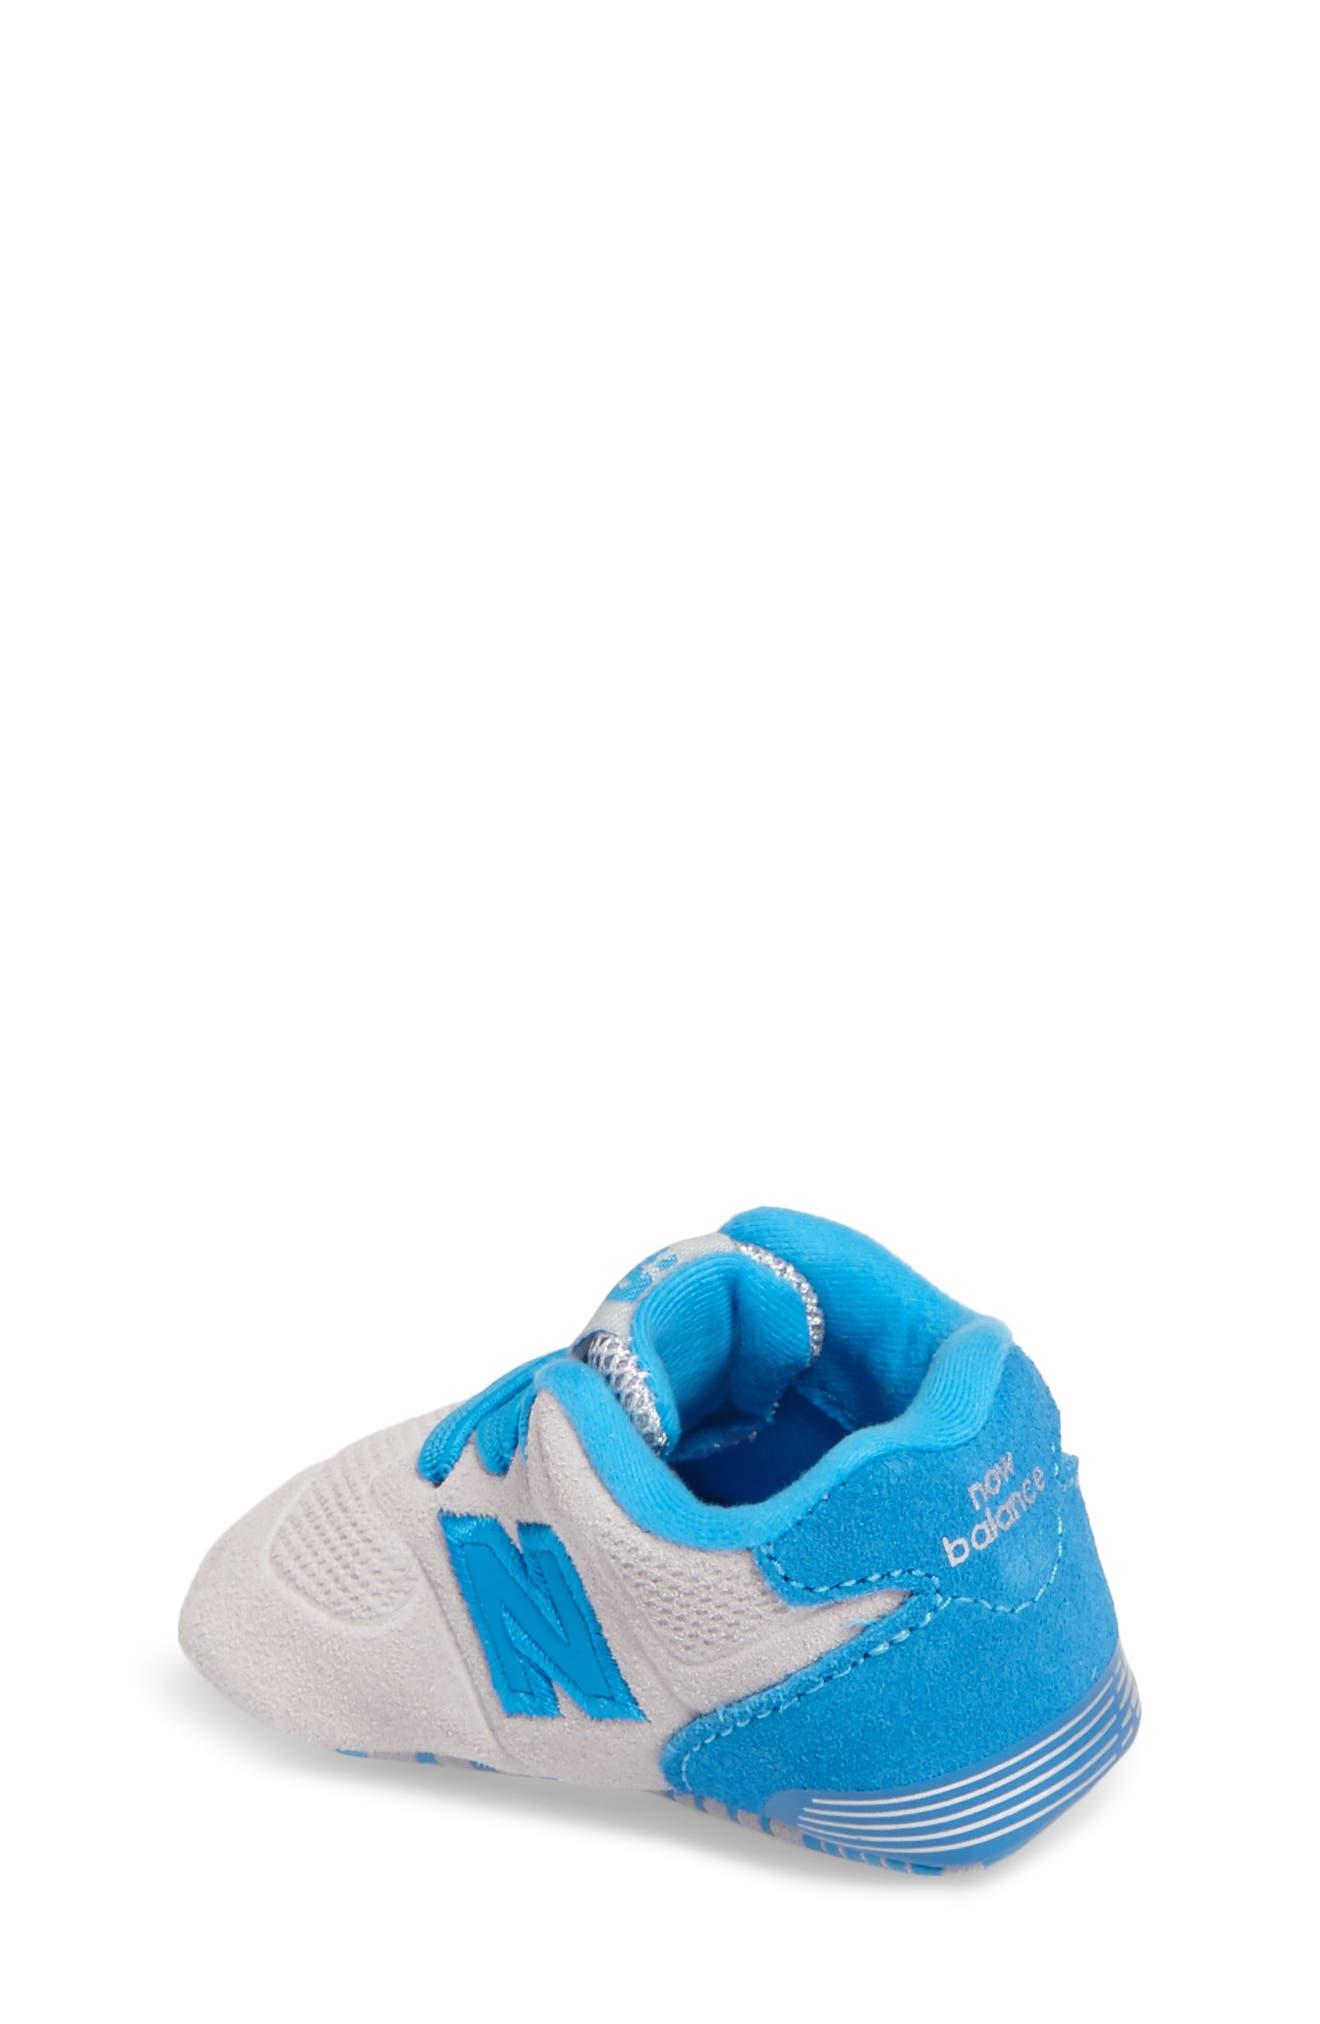 547 Crib Shoe,                             Alternate thumbnail 2, color,                             Blue/ Grey